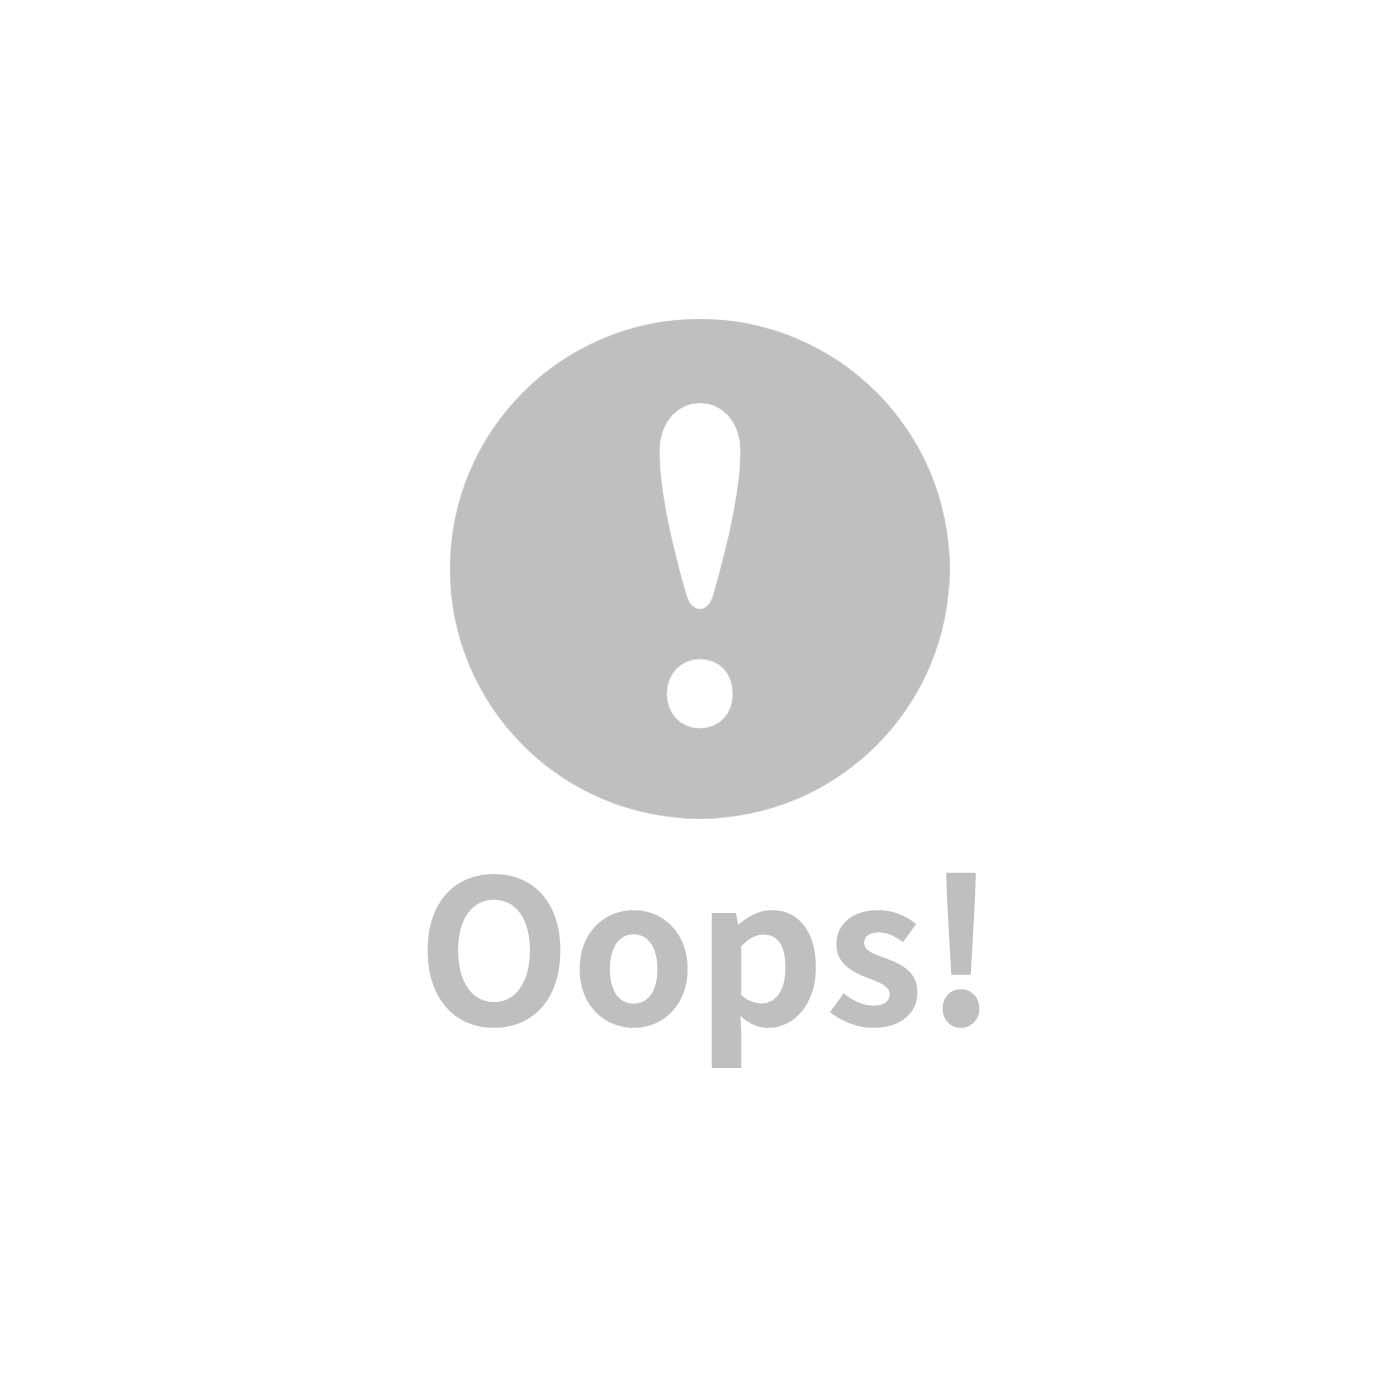 La Millou Moonies頂級羊皮膠底學步鞋禮盒11-18m_魔鬼氈款(草莓)